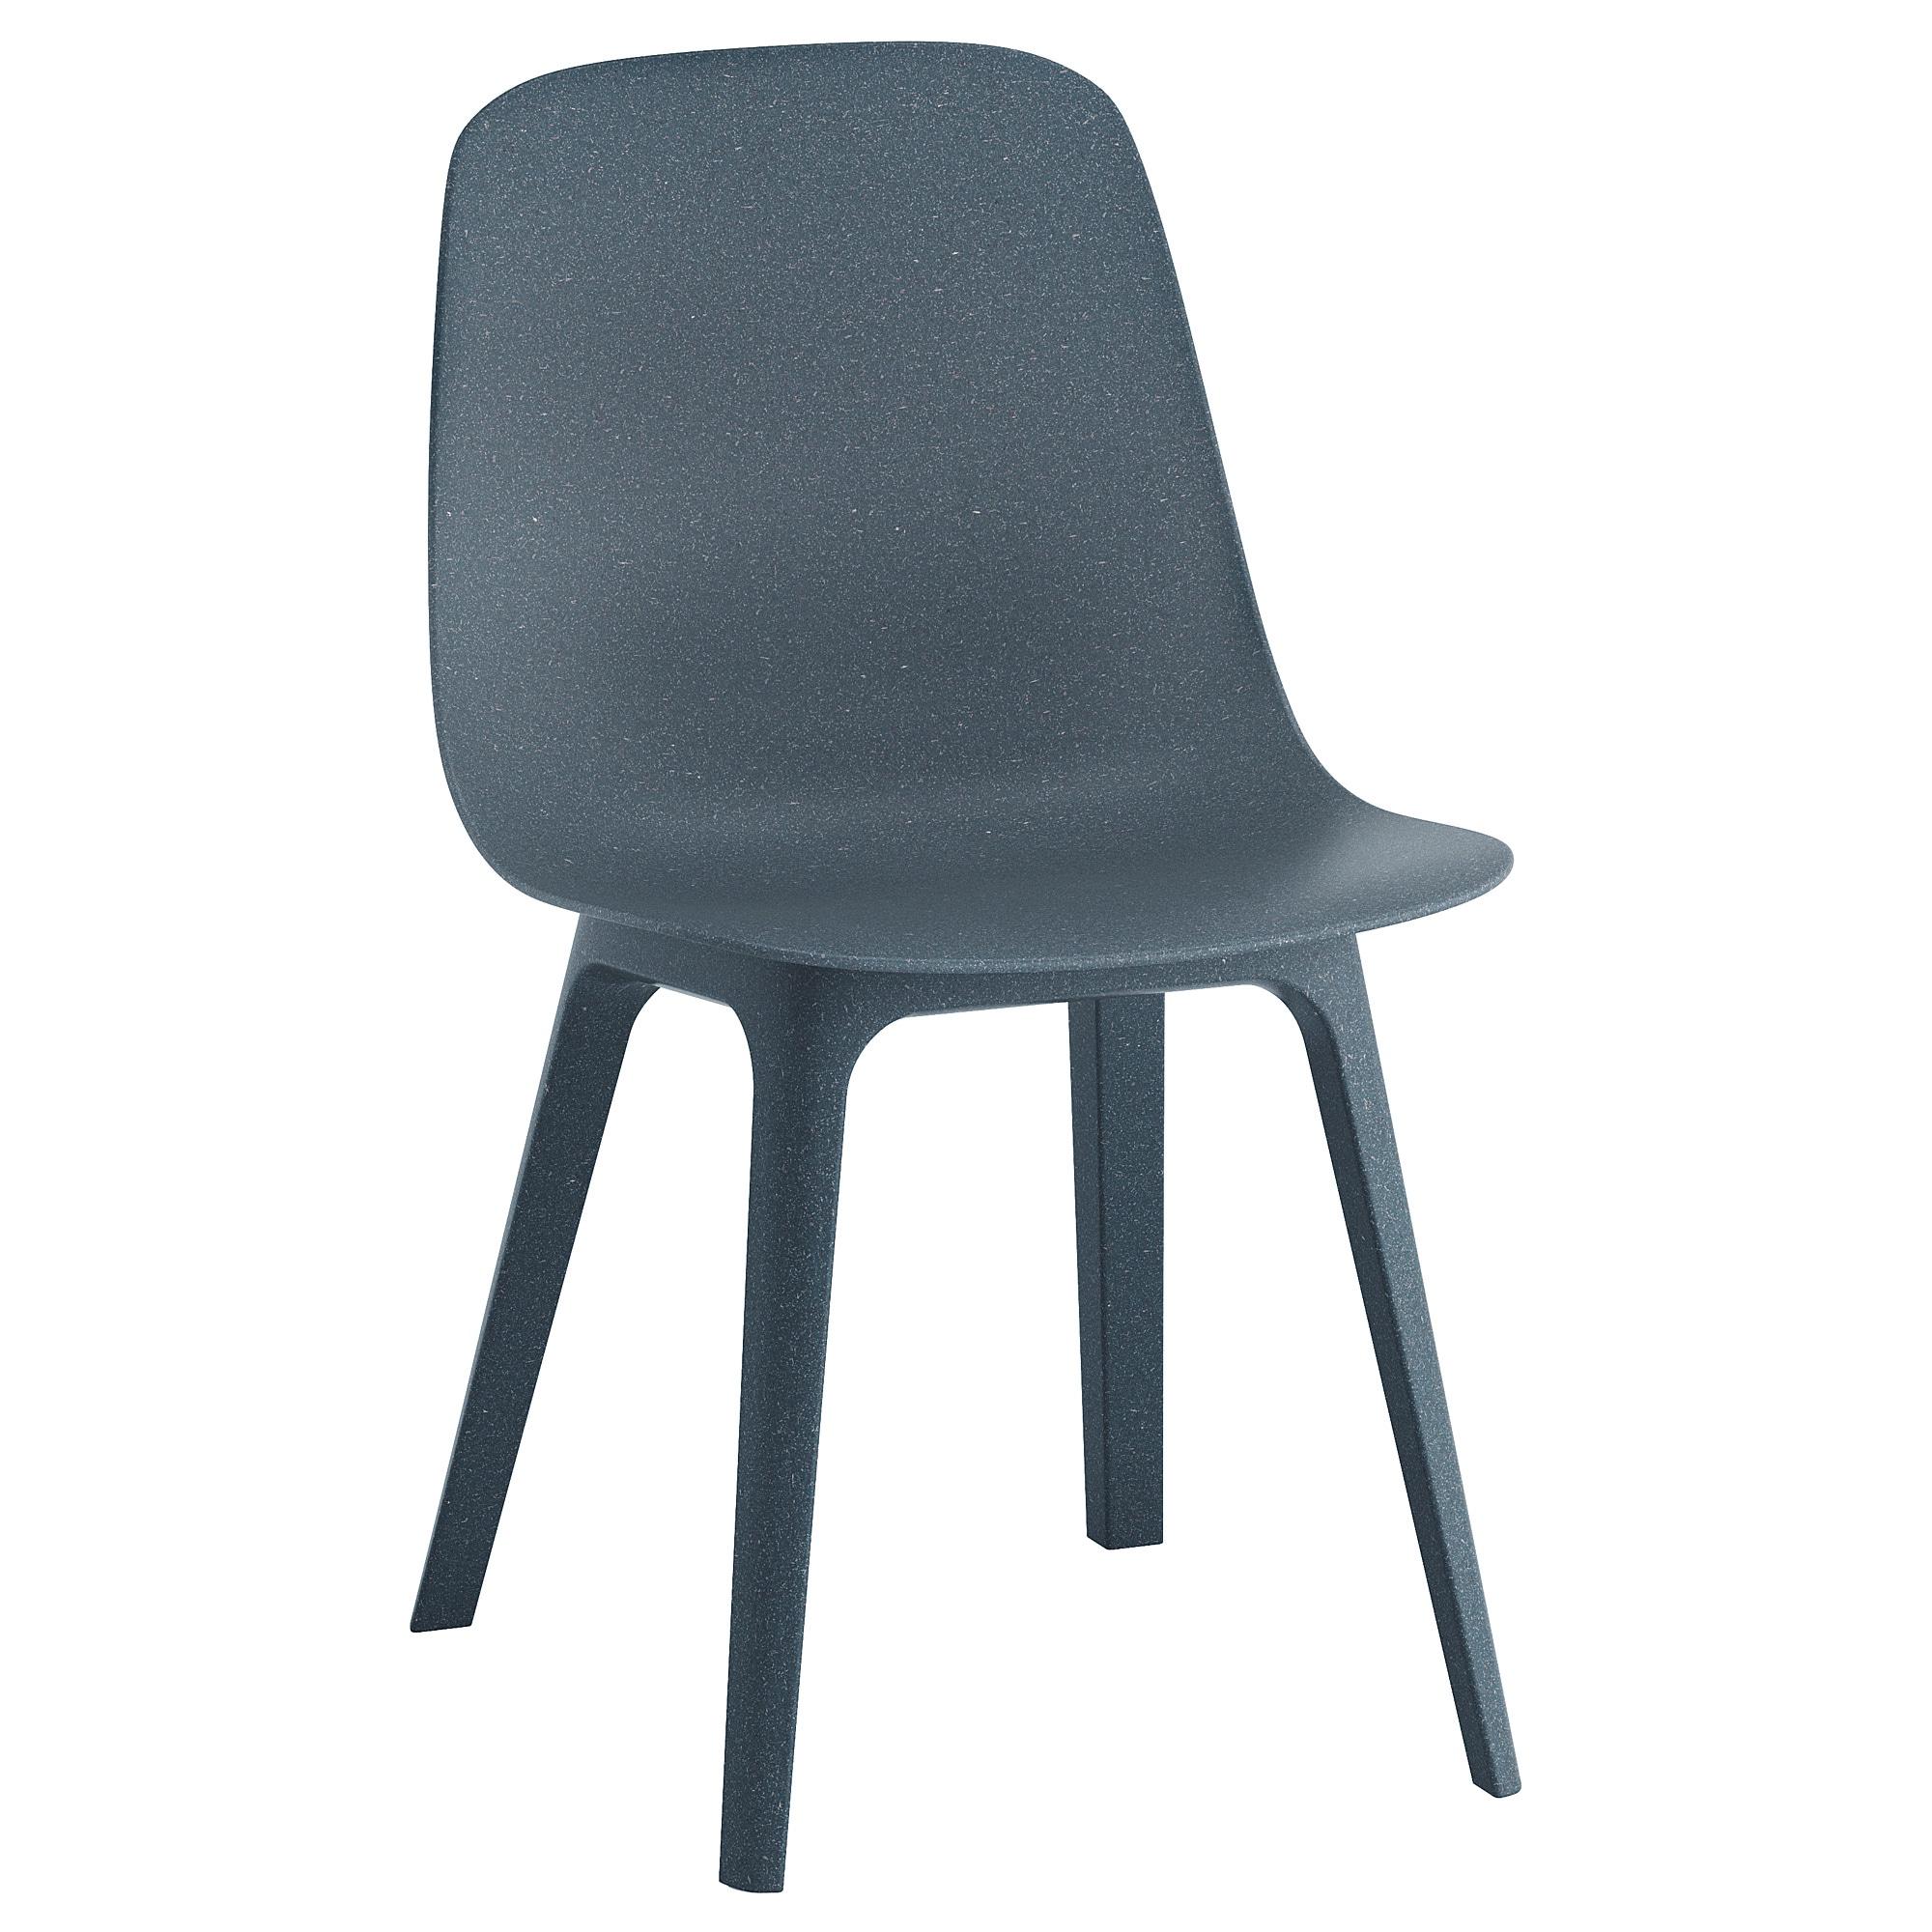 Ikea Sillas Comedor Rldj Odger Silla Azul Ikea